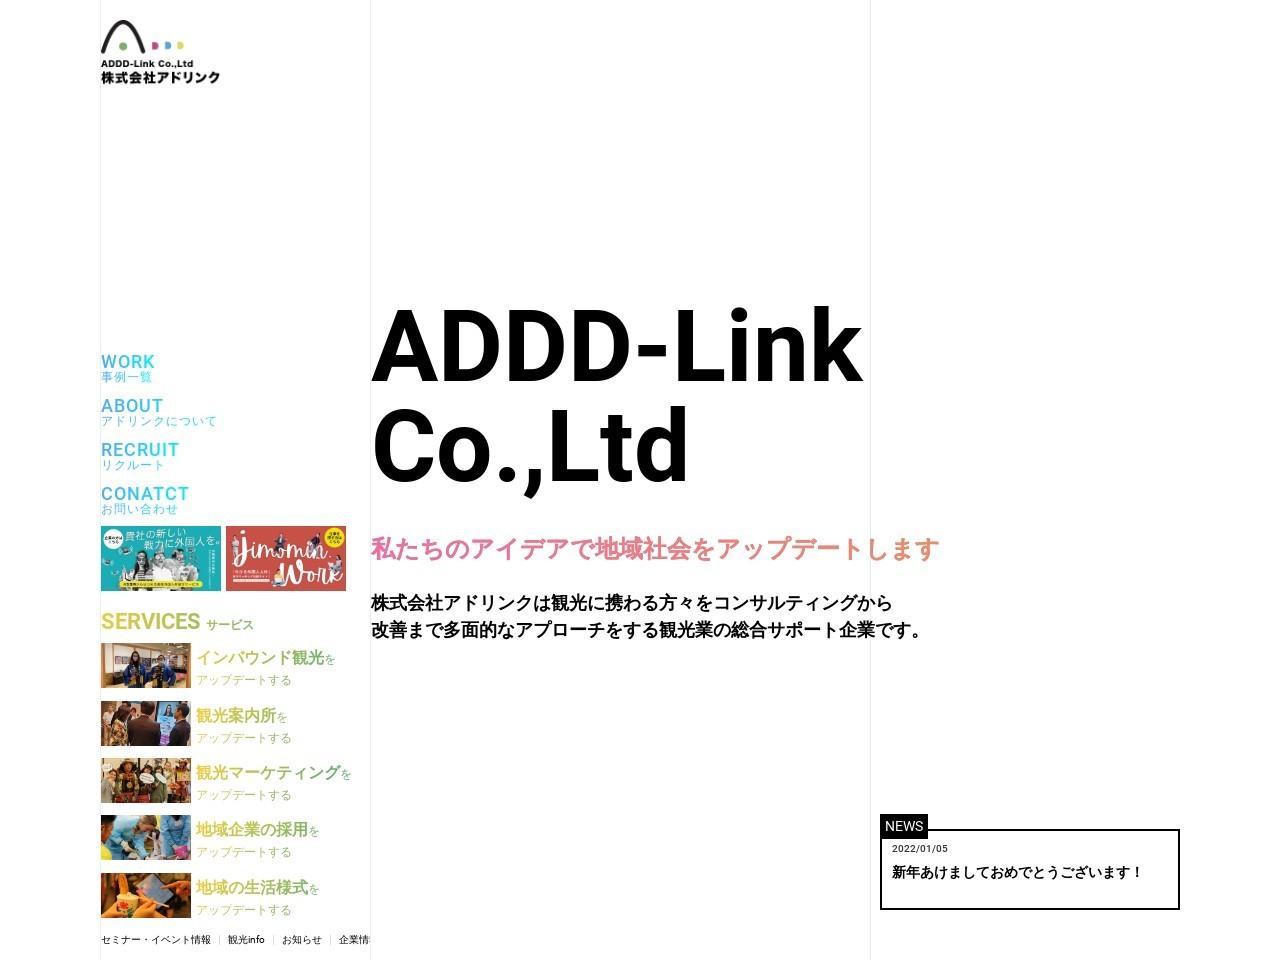 http://addd-link.co.jp/service.html